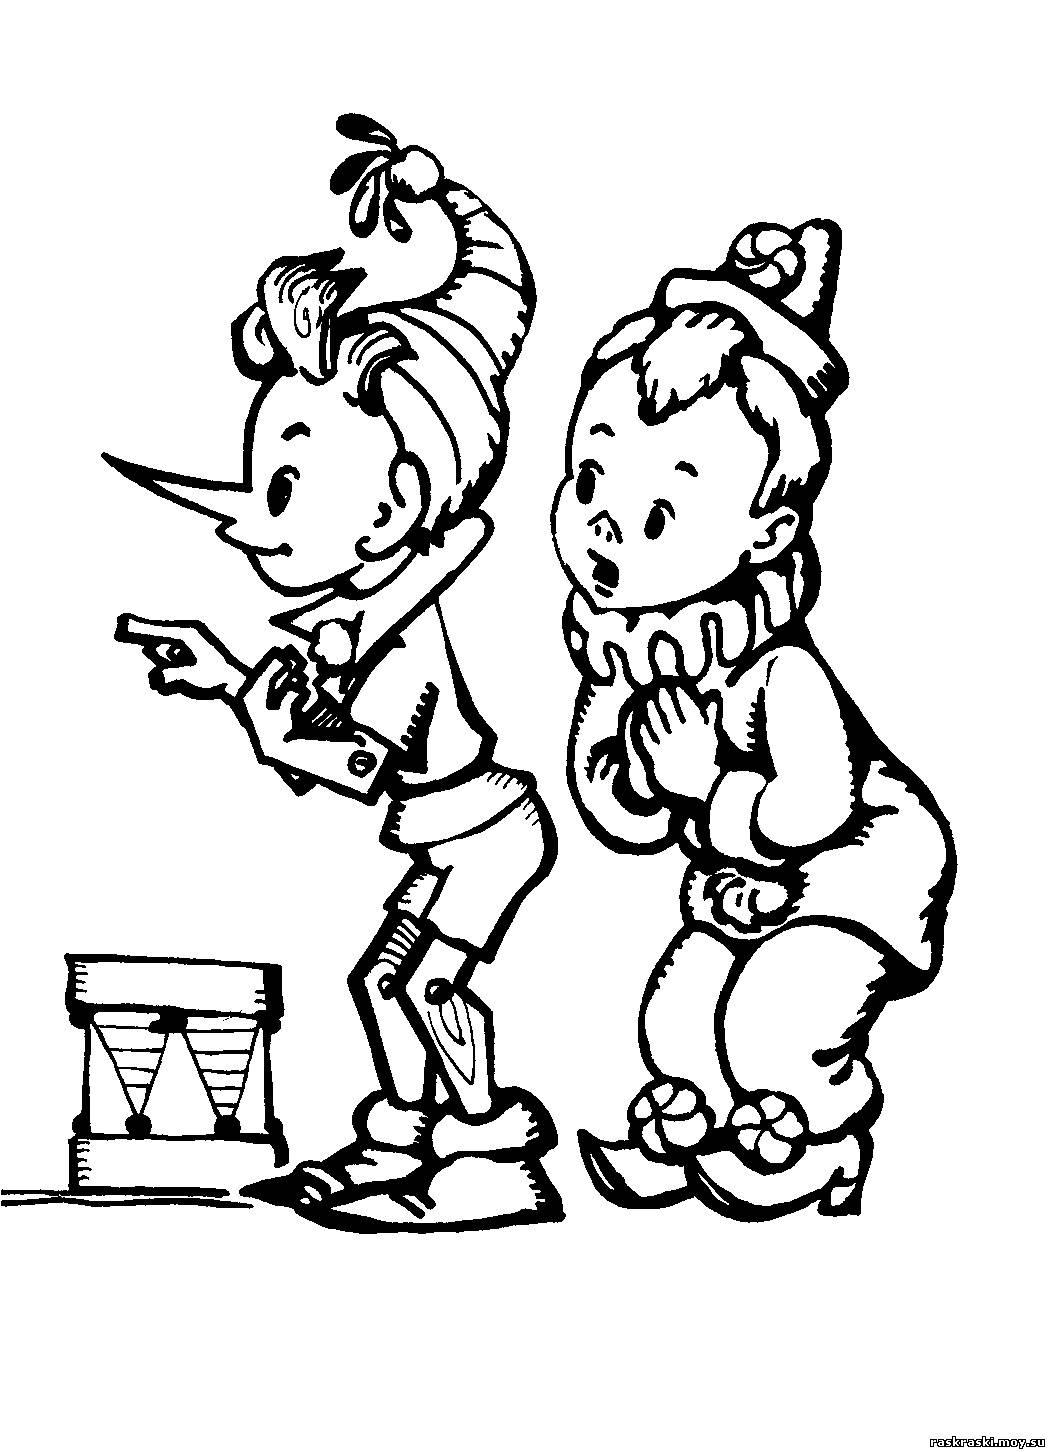 Буратино - Раскраски - Сборник раскрасок - Раскраски для детей